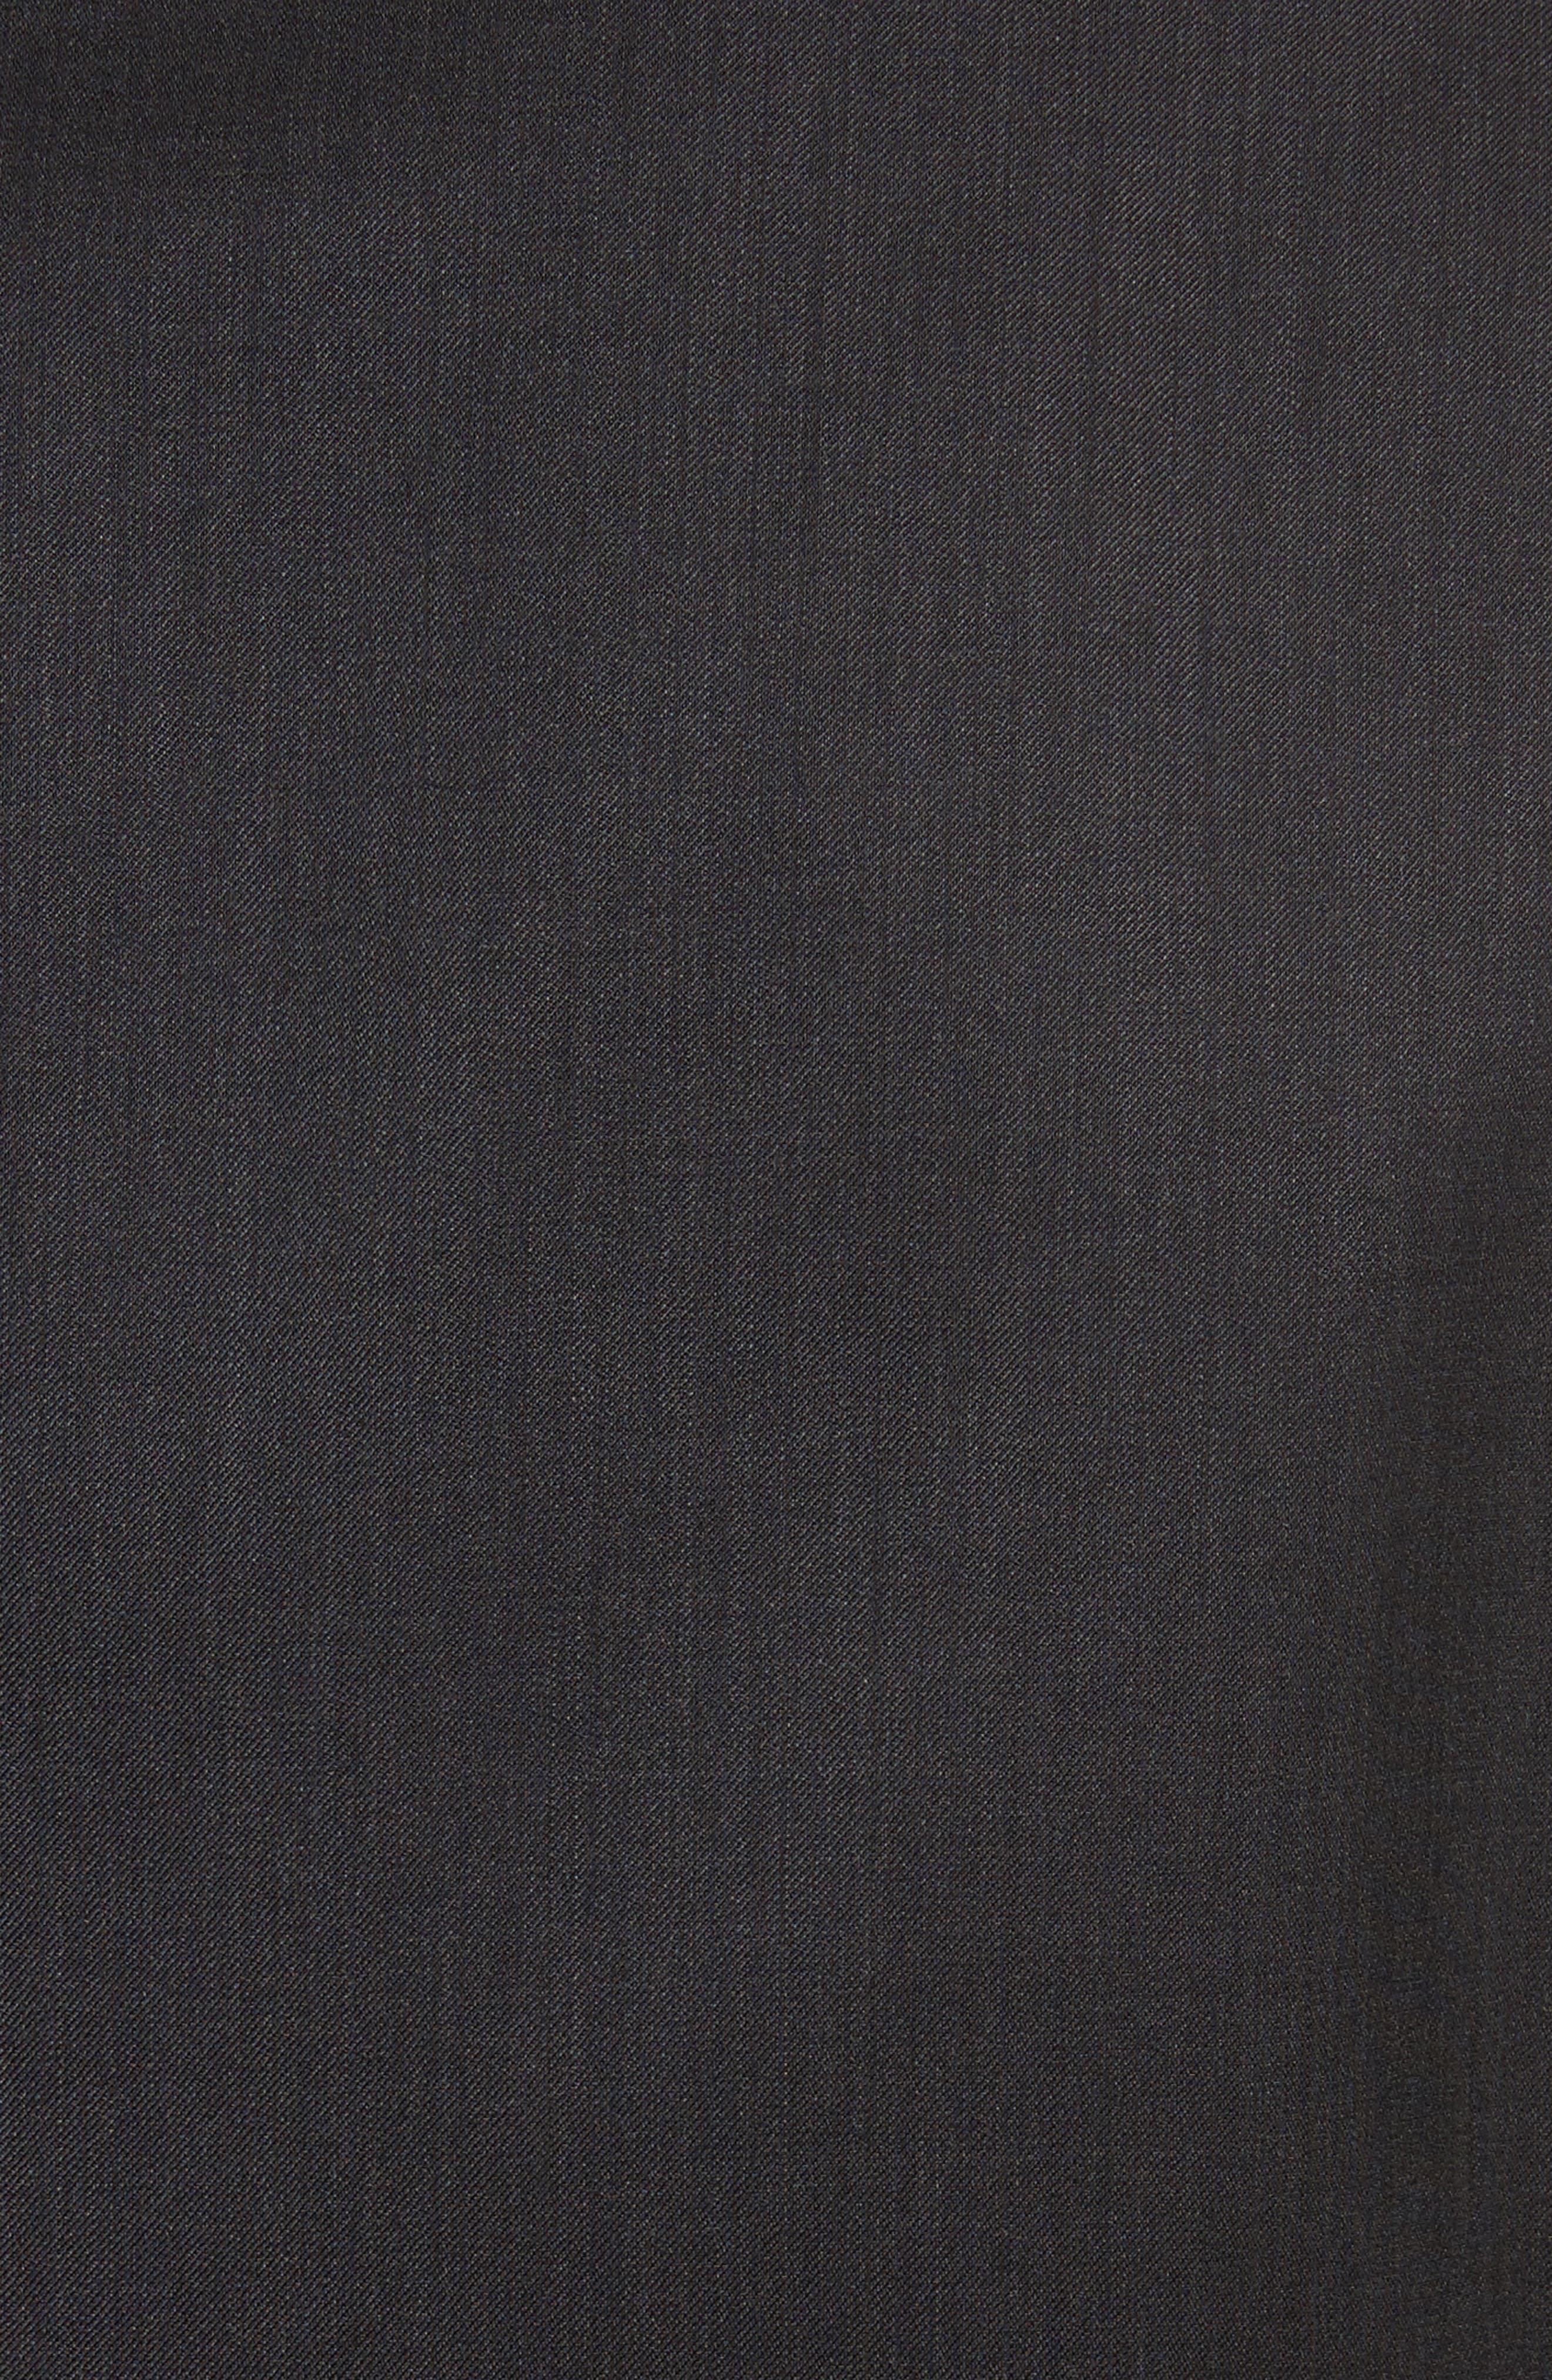 'G-Line' Trim Fit Solid Wool Suit,                             Alternate thumbnail 7, color,                             Charcoal